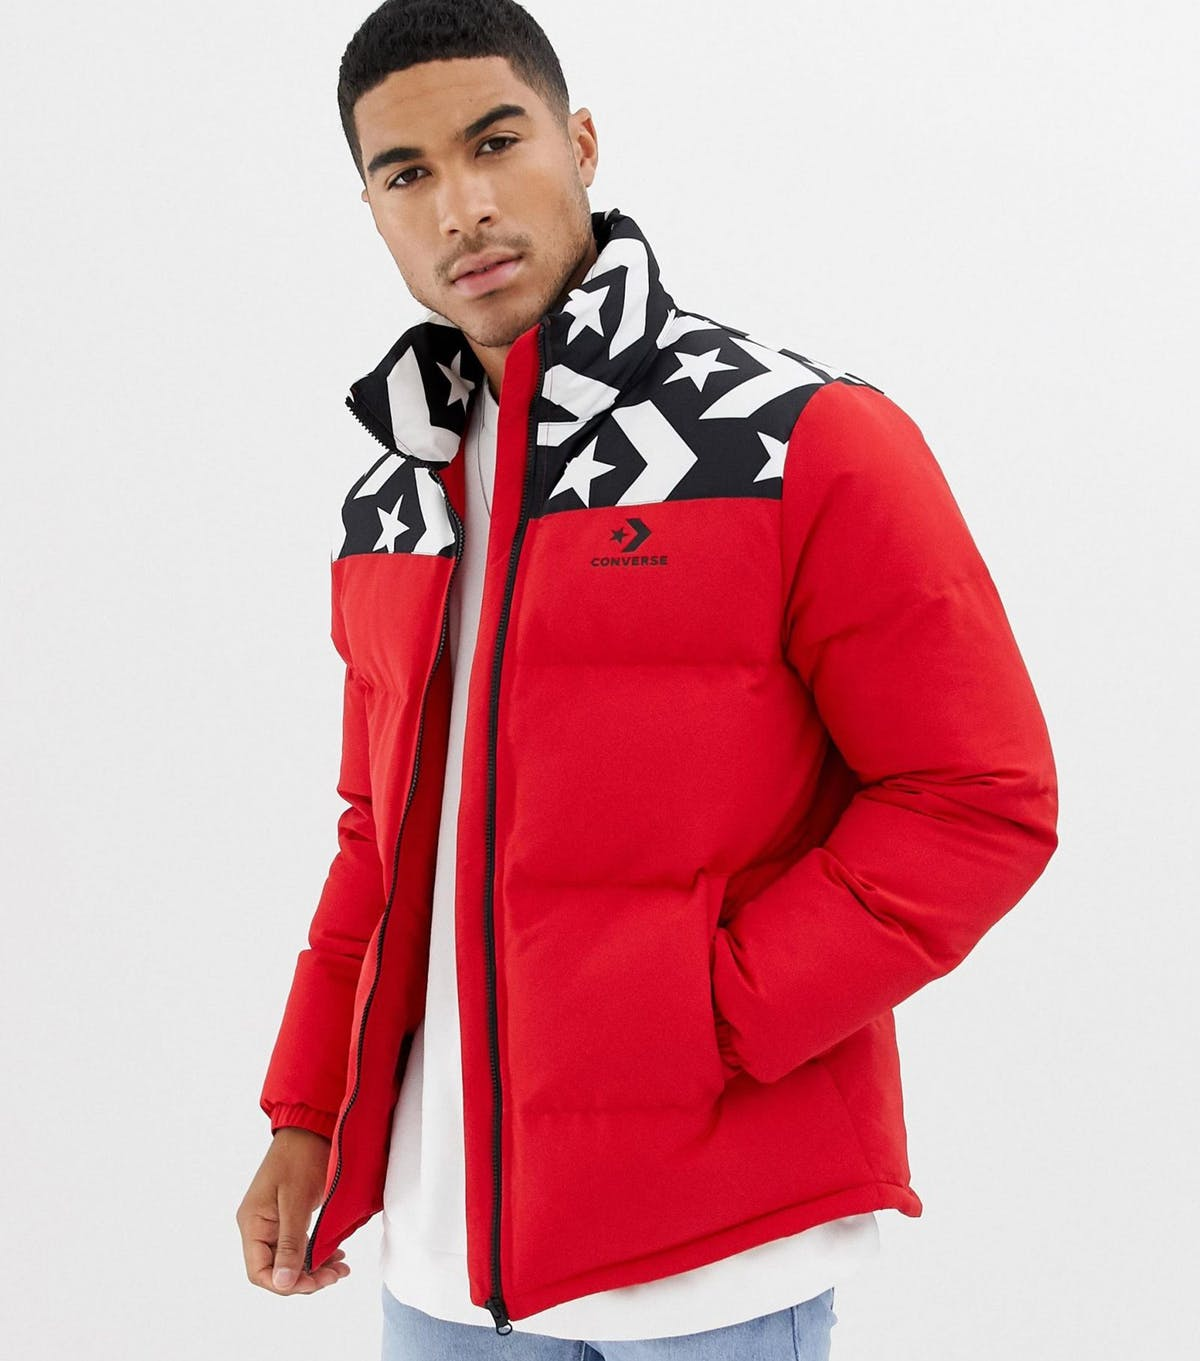 Asos Converse Puffer Jacket